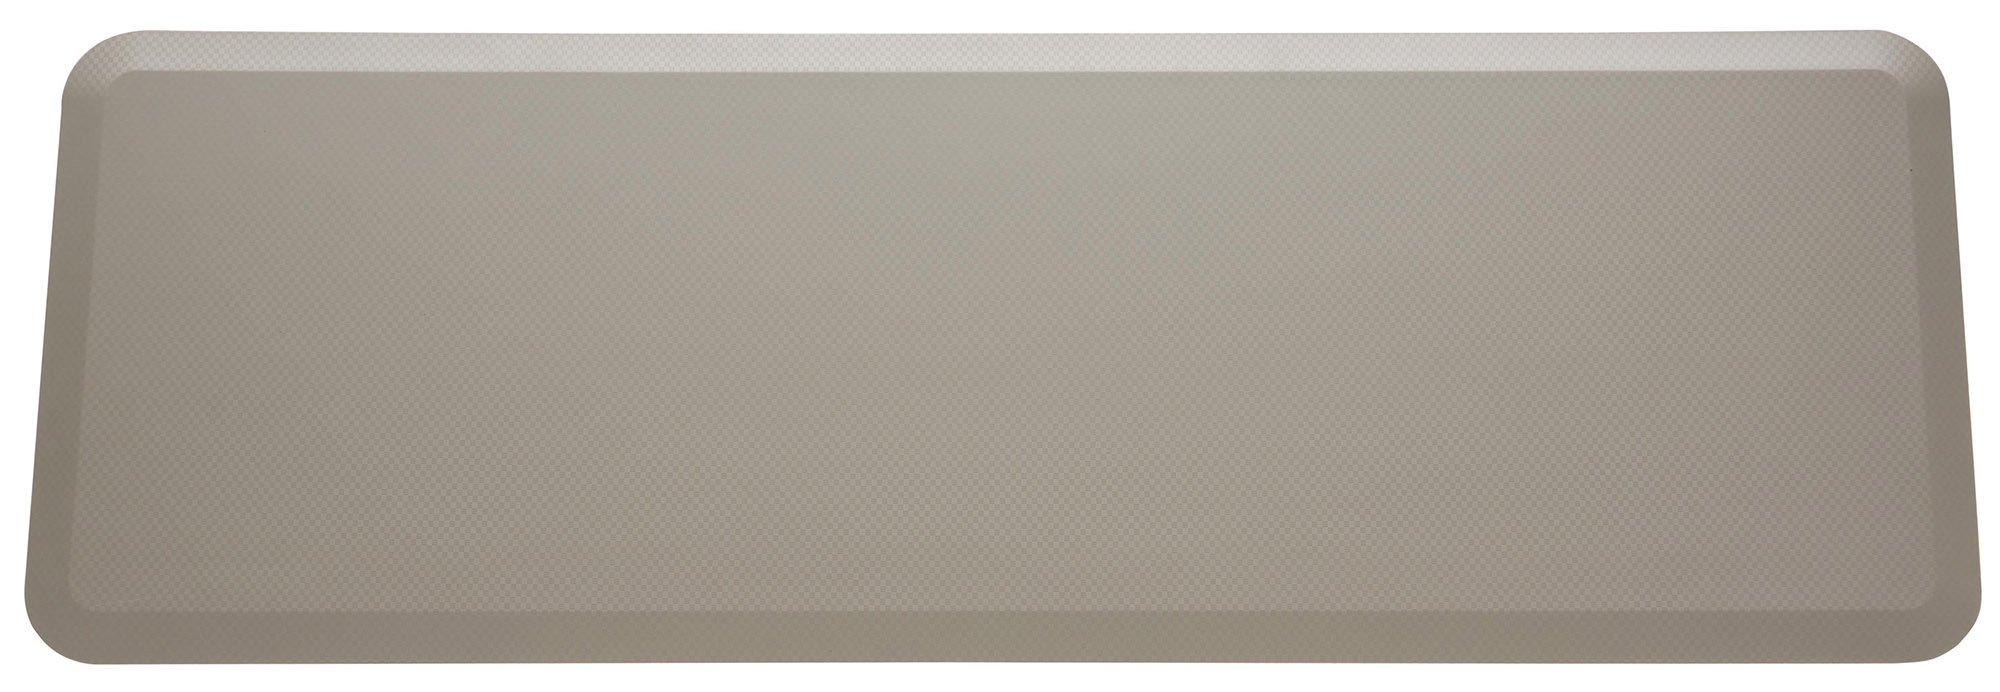 Arrowhead Healthcare Supply P-107350-24-01 FLATMAT, 24'' Wide, Bedside Fall Mat, Warm Grey